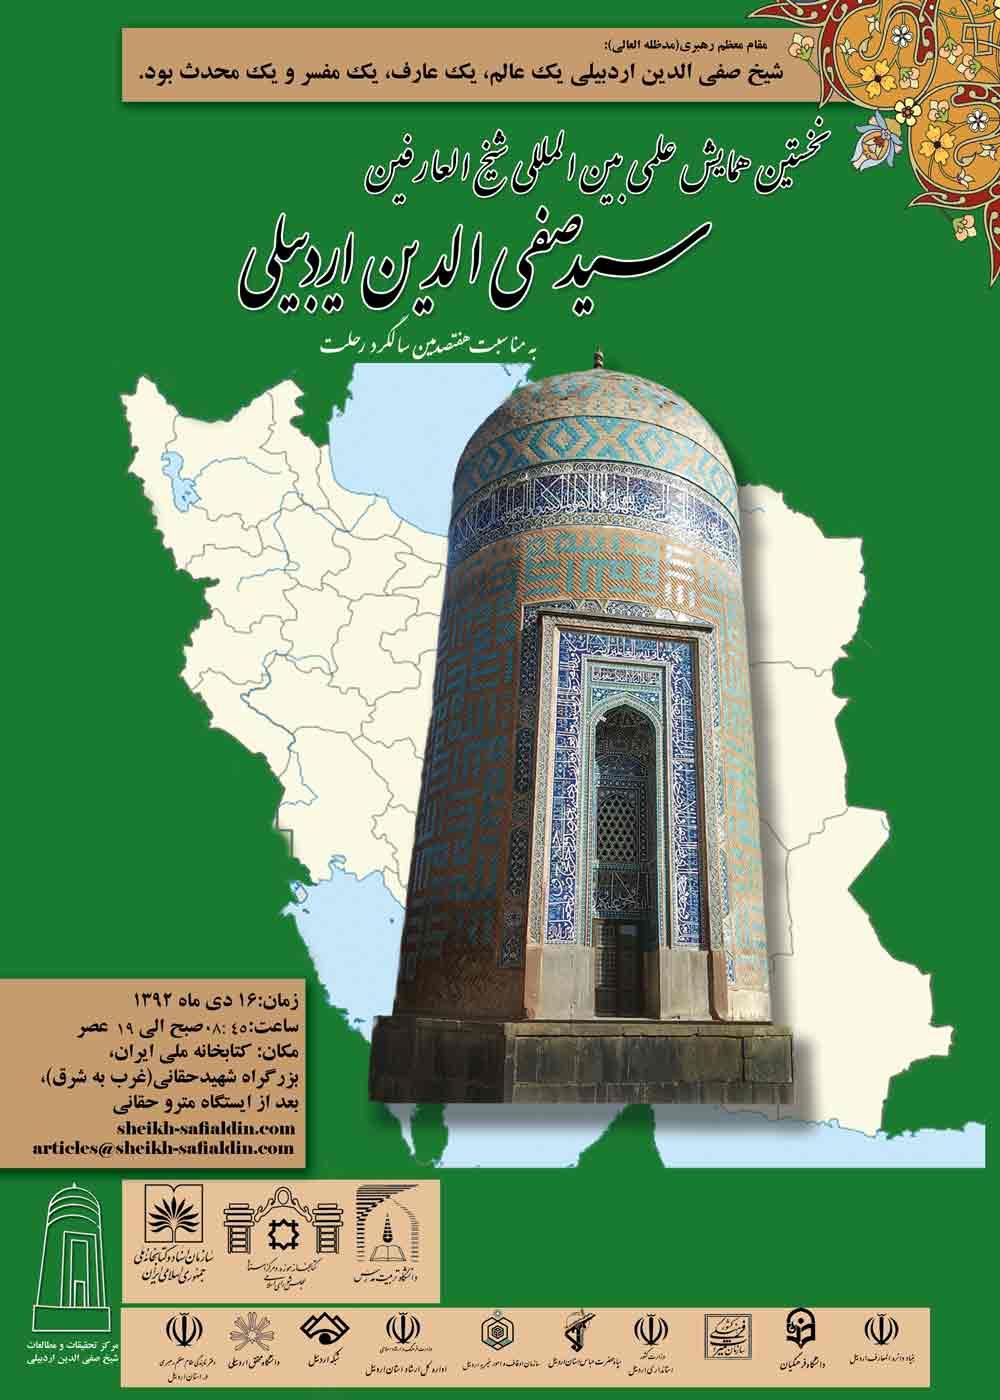 Sheikh-Safi-al-Din-Ardabili-Web-Poster